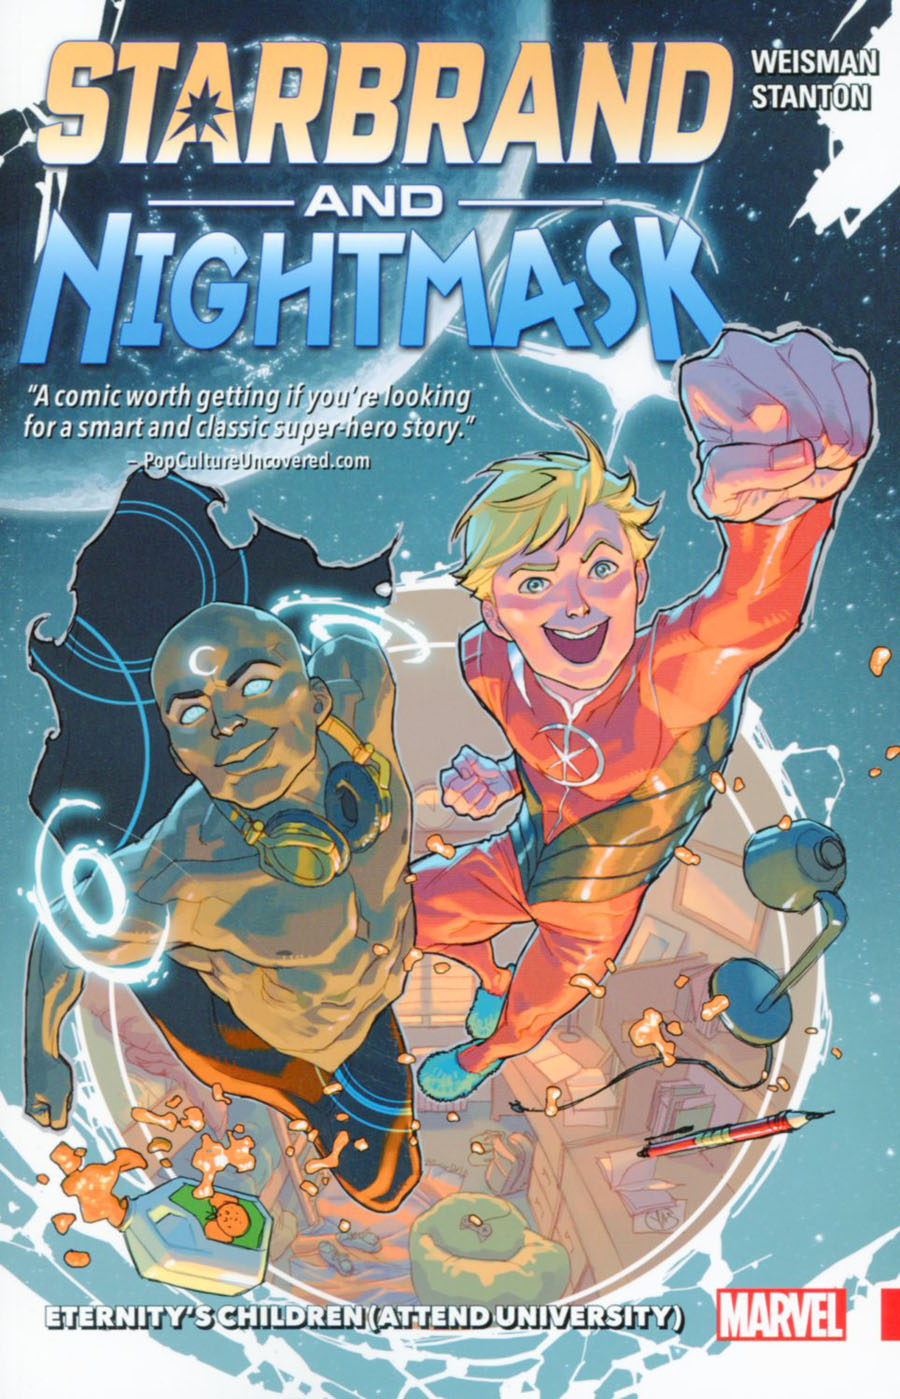 Starbrand And Nightmask Eternitys Children (Attend University) TP